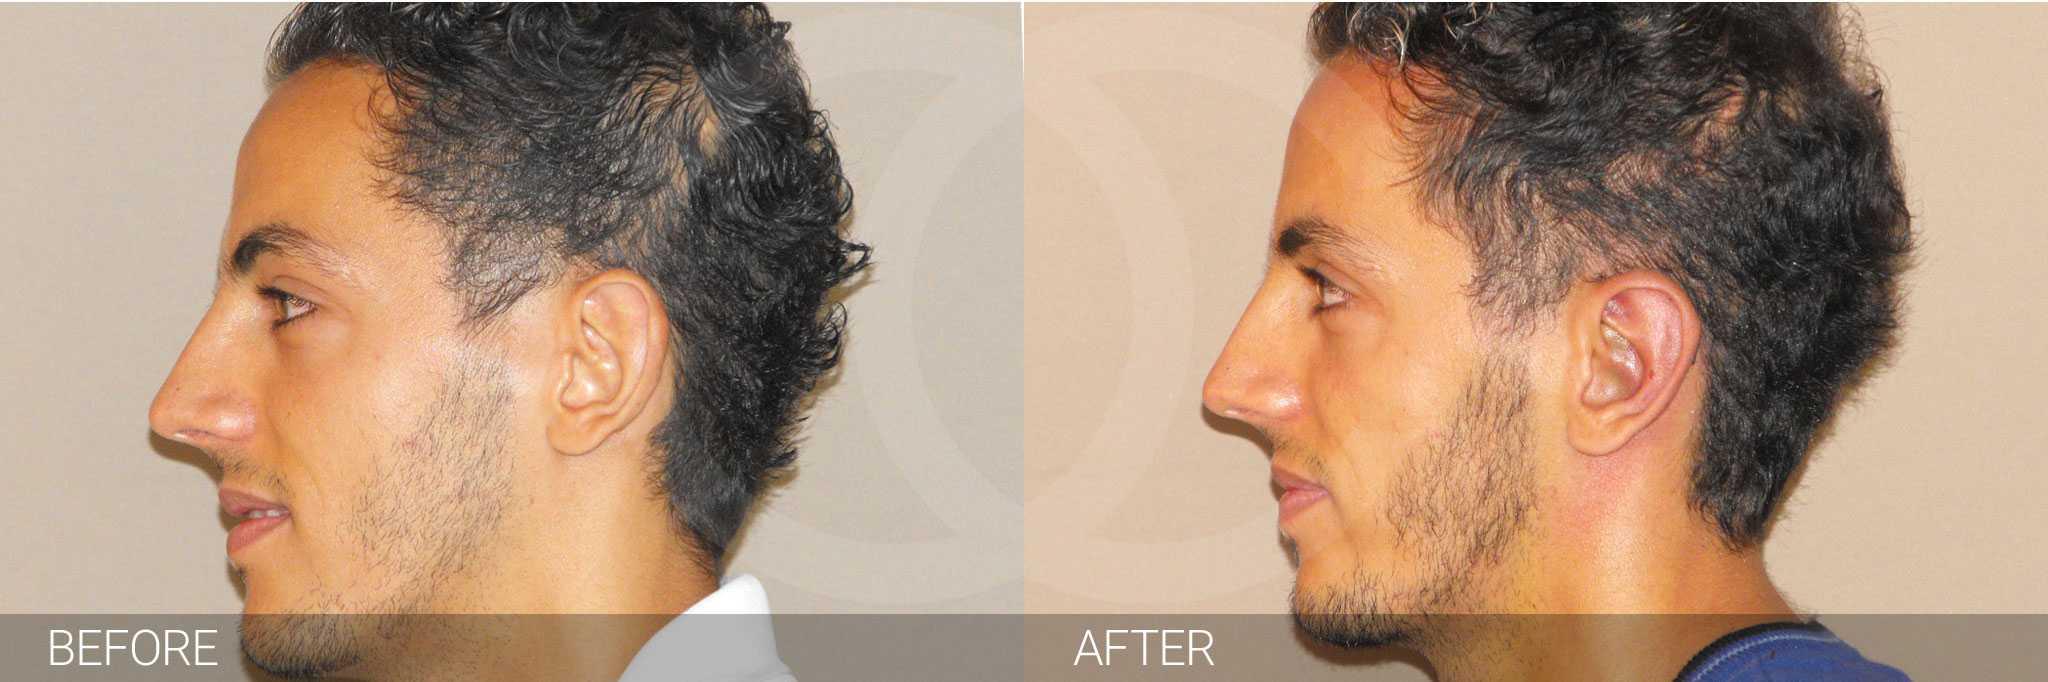 Chirurgie des oreilles 2 ante/post-op III